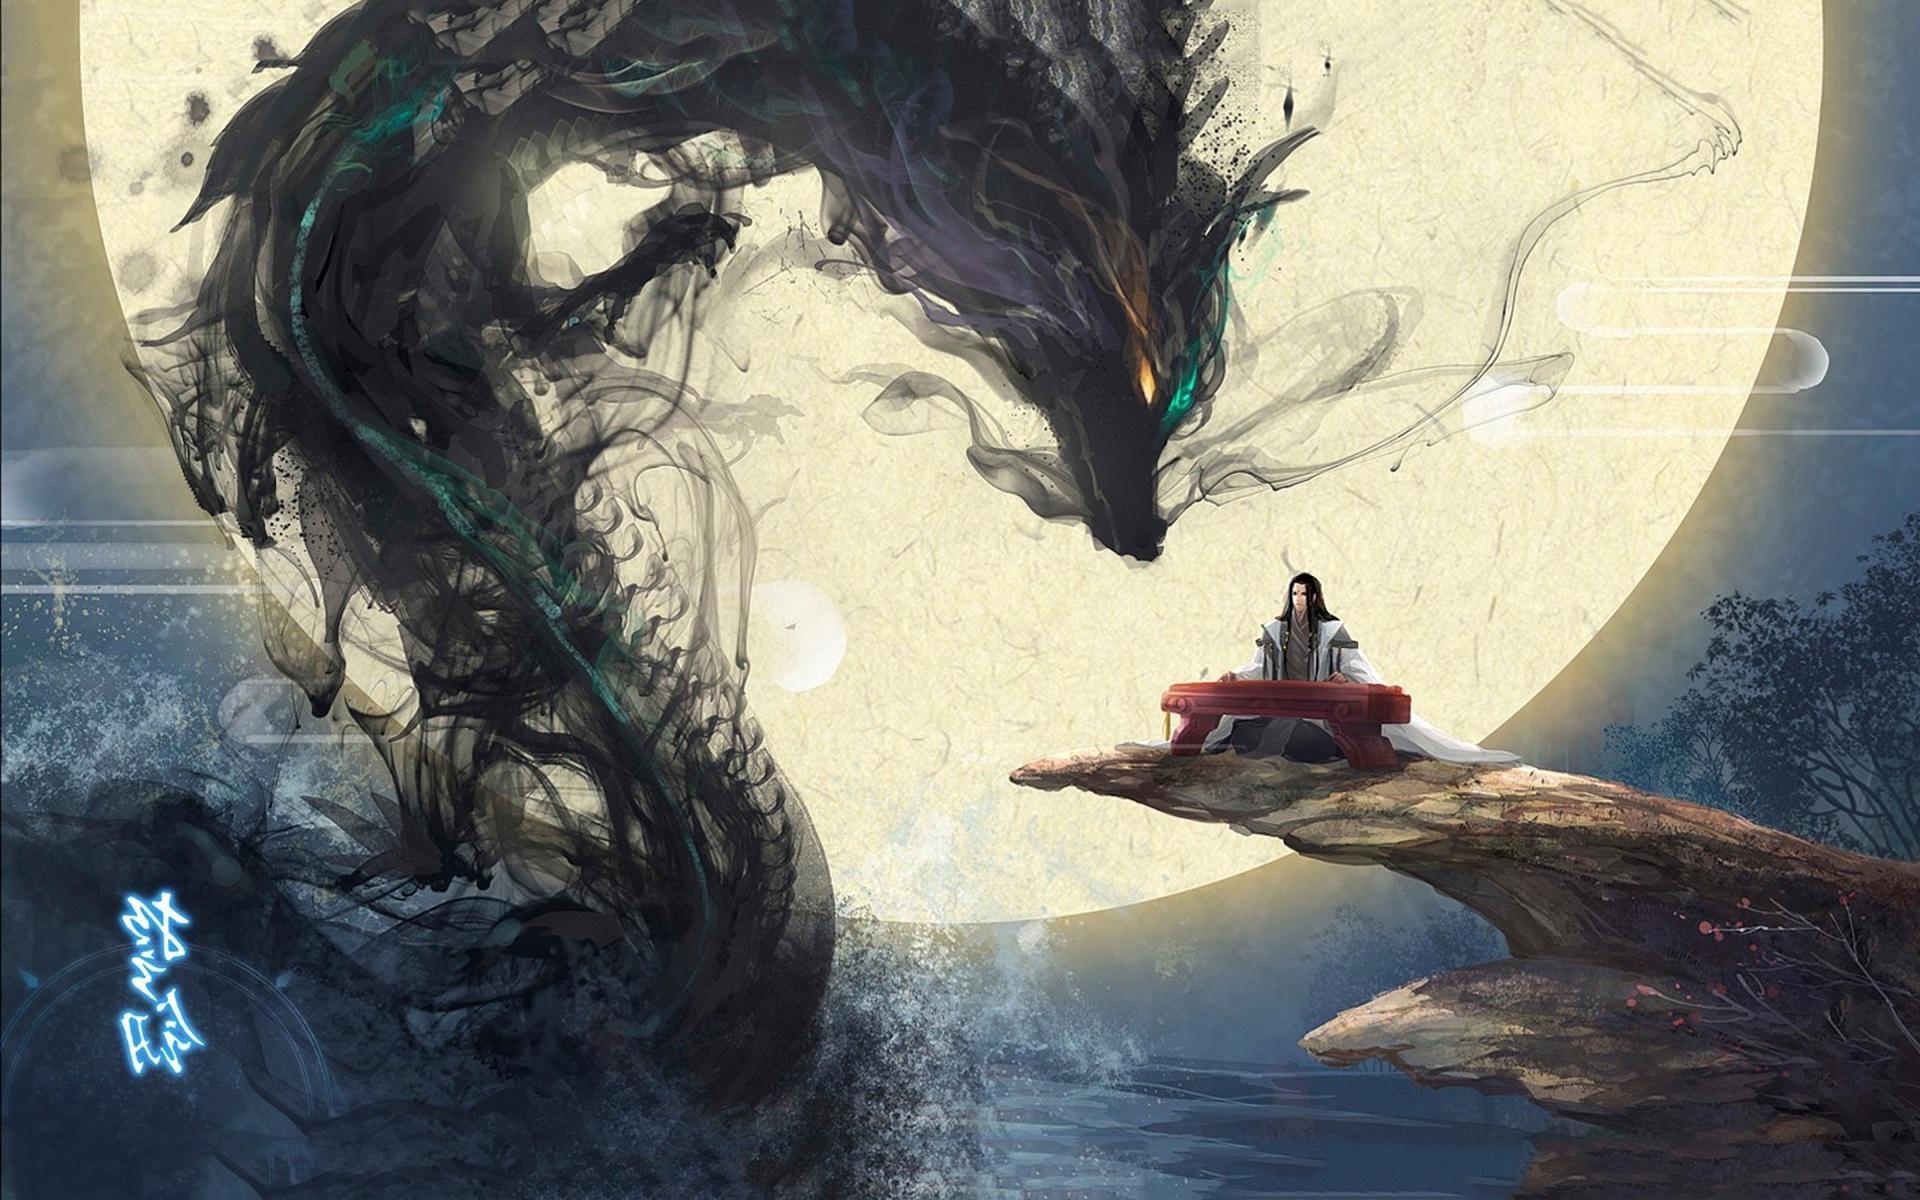 Dragon music